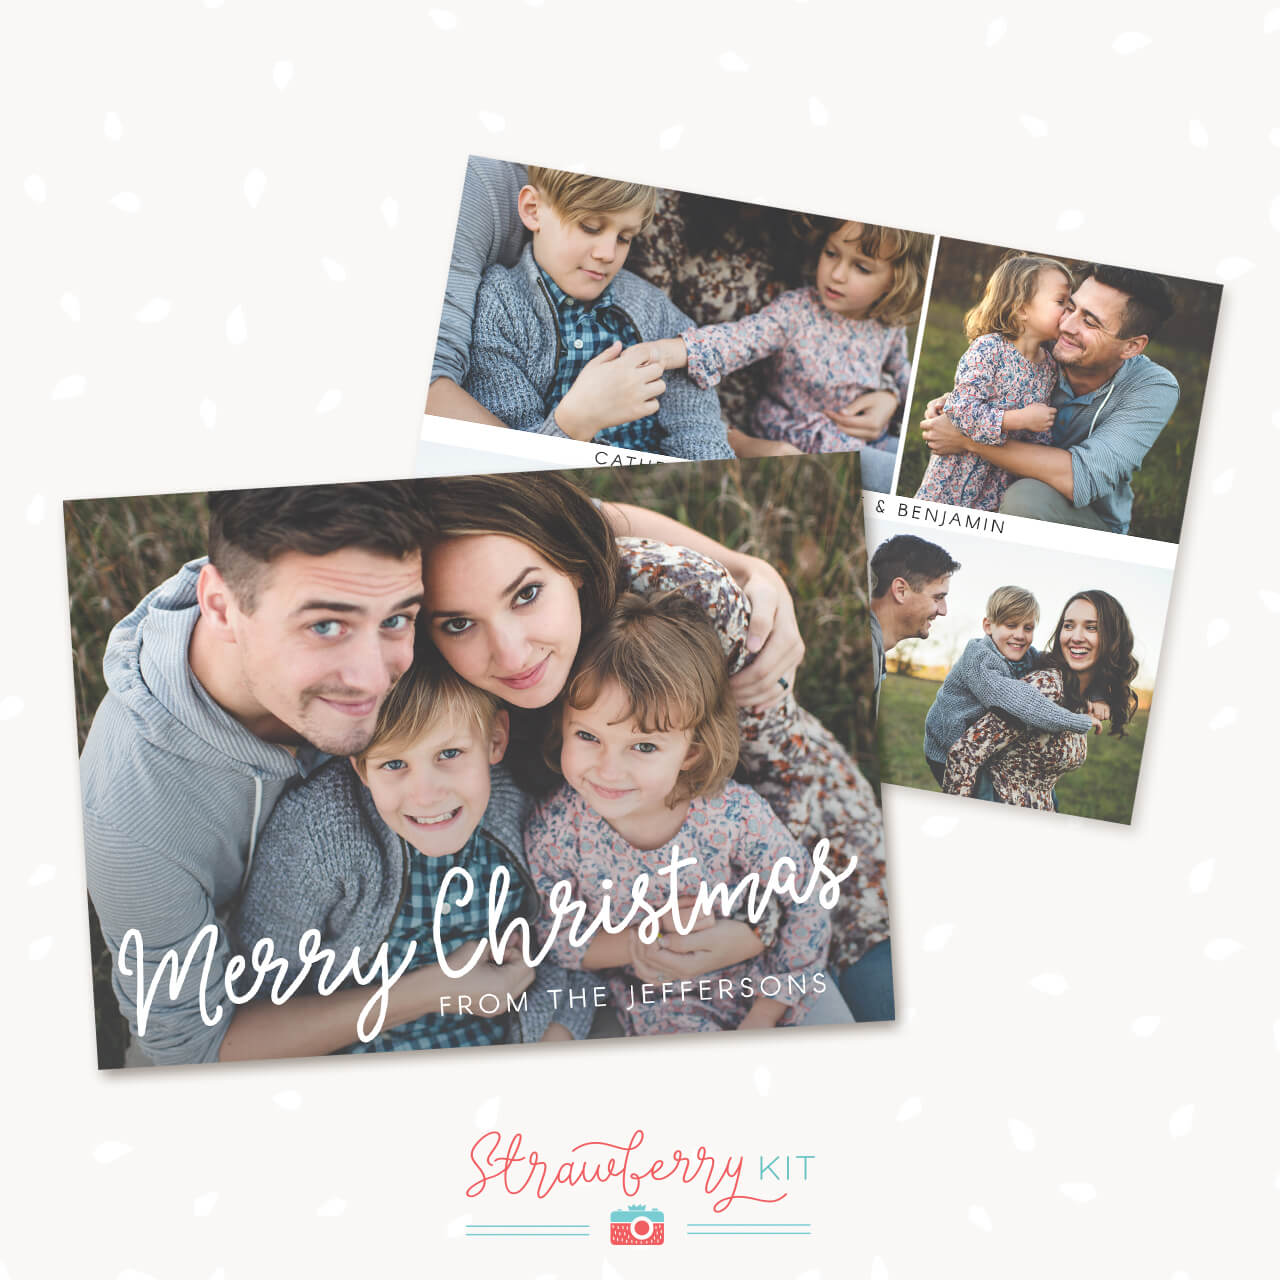 Photo Christmas Card Template Brush Lettering Strawberry Kit